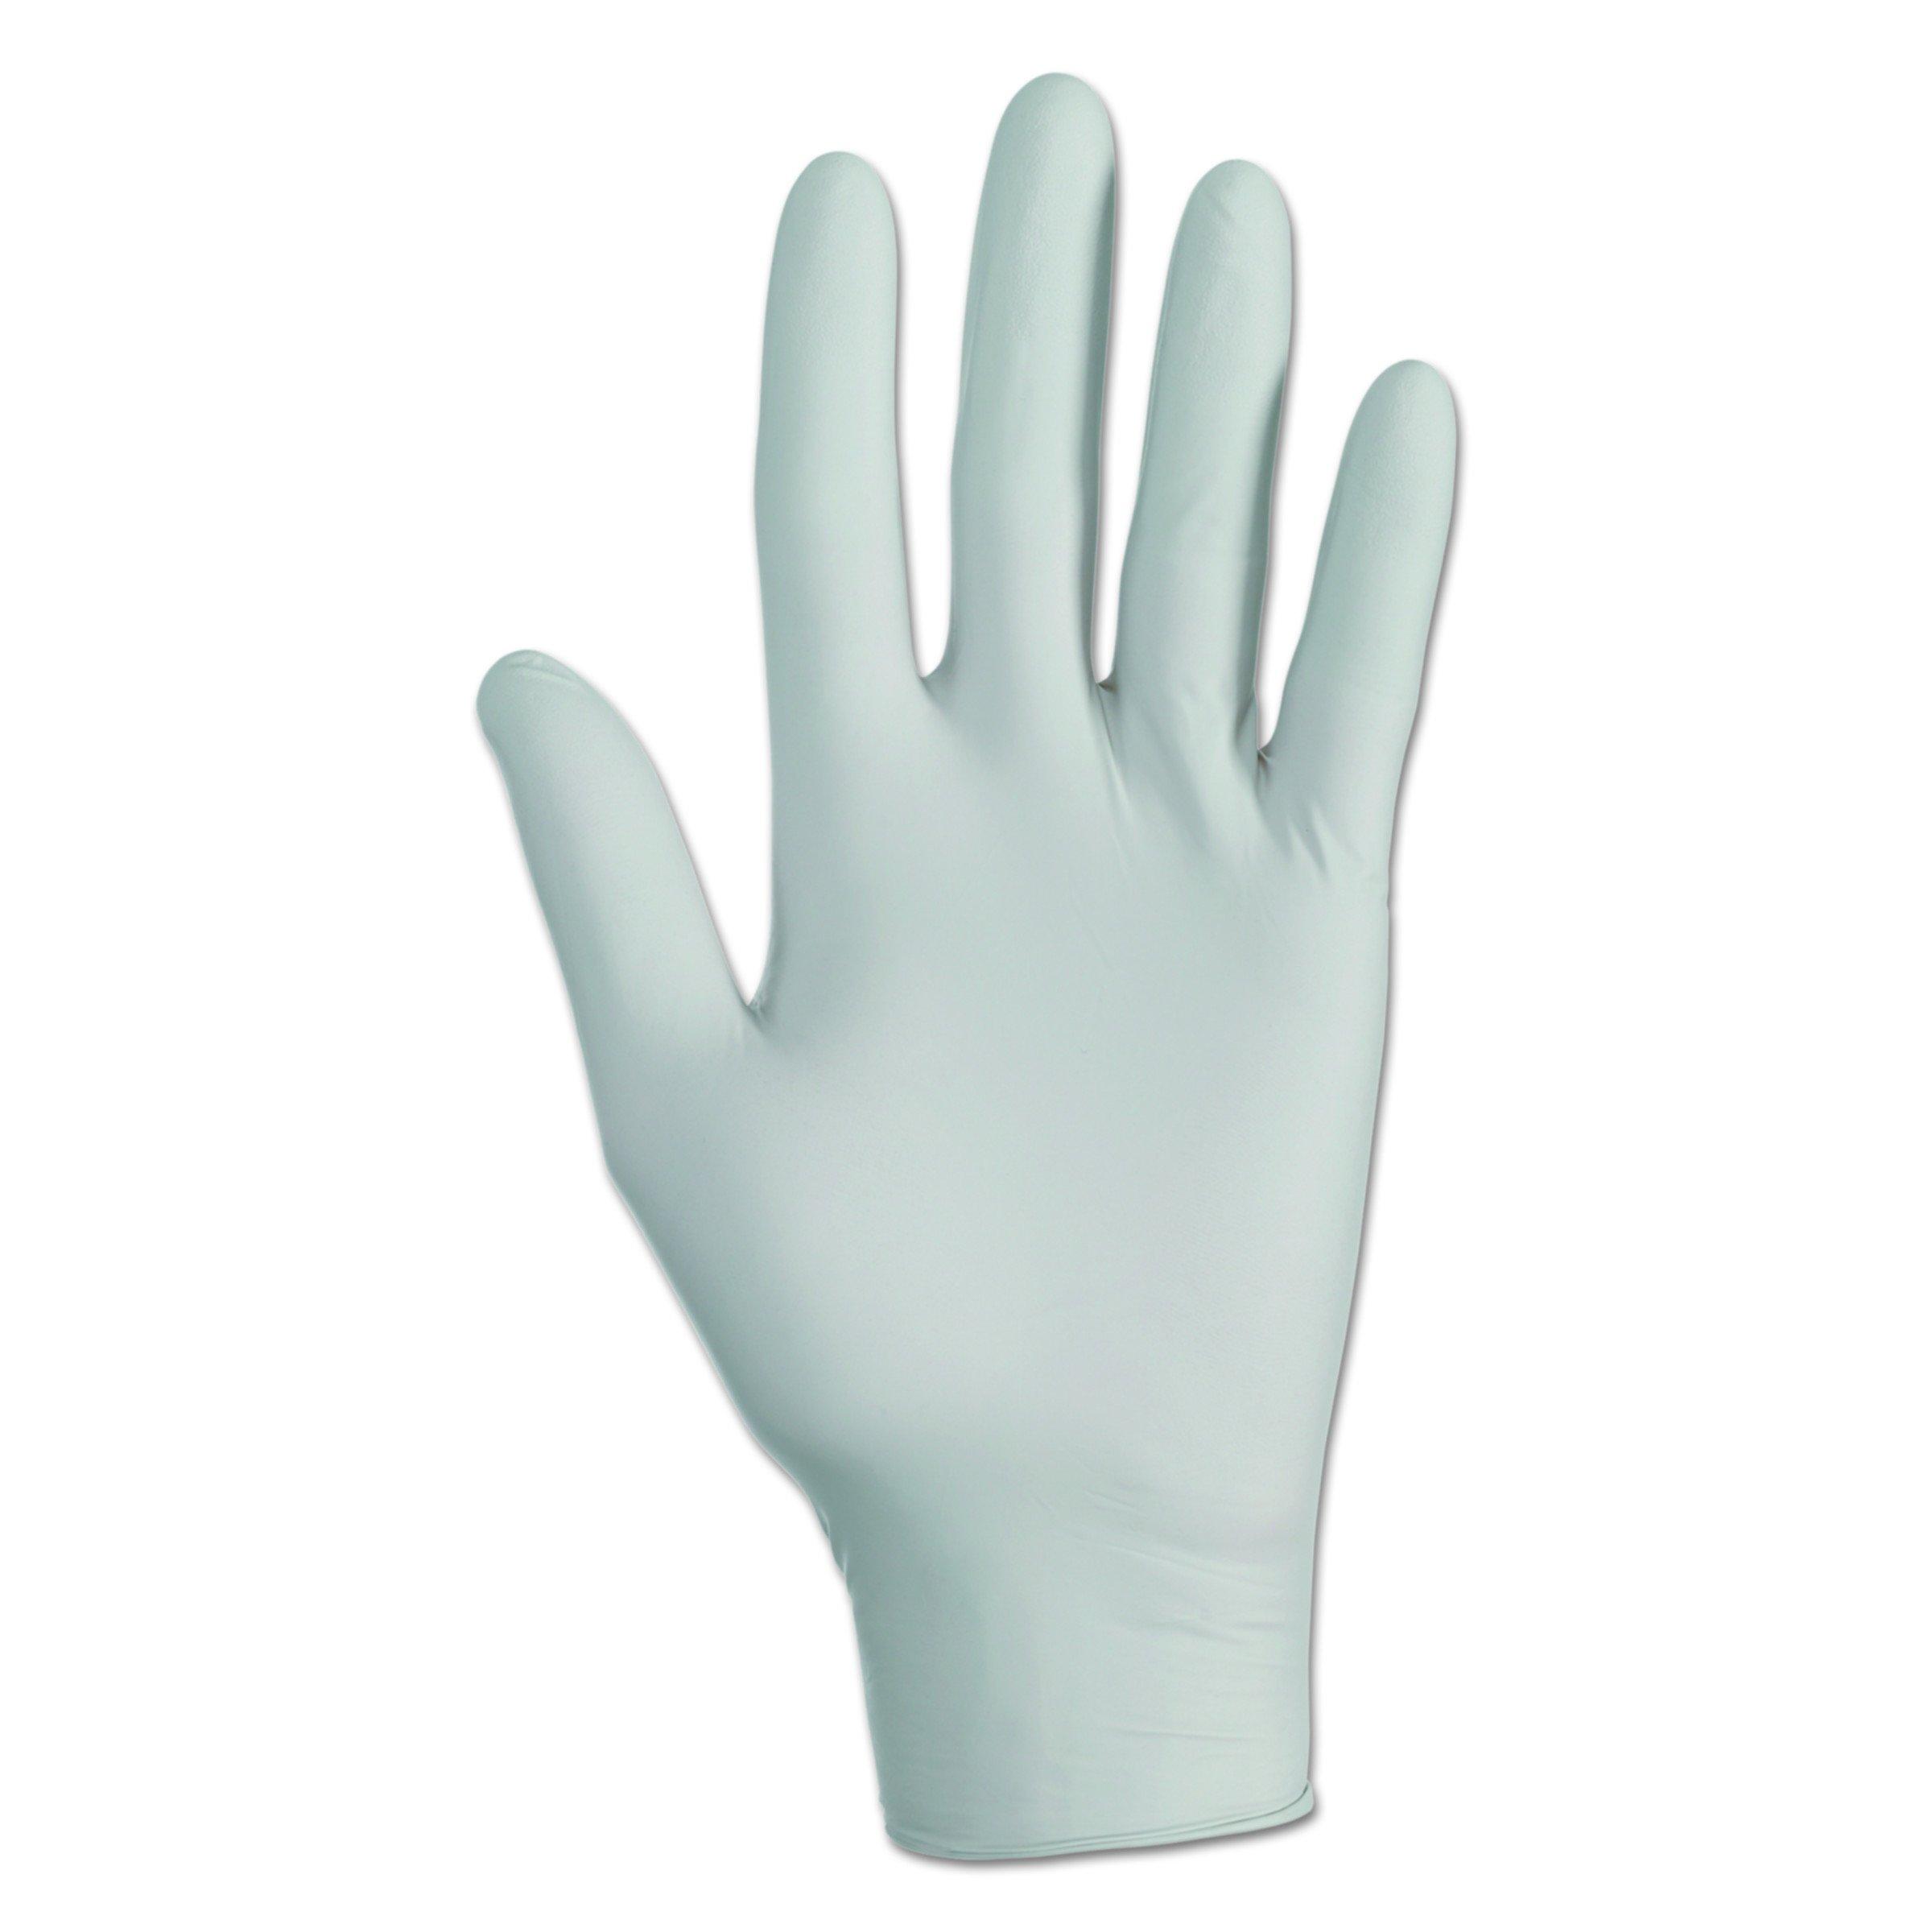 Kleenguard G10 Grey Nitrile Gloves (97823), Large, Powder-Free , Ambidextrous , Thin Mil, 50% More / Case, 150 Gloves / Box, 10 Boxes / Case